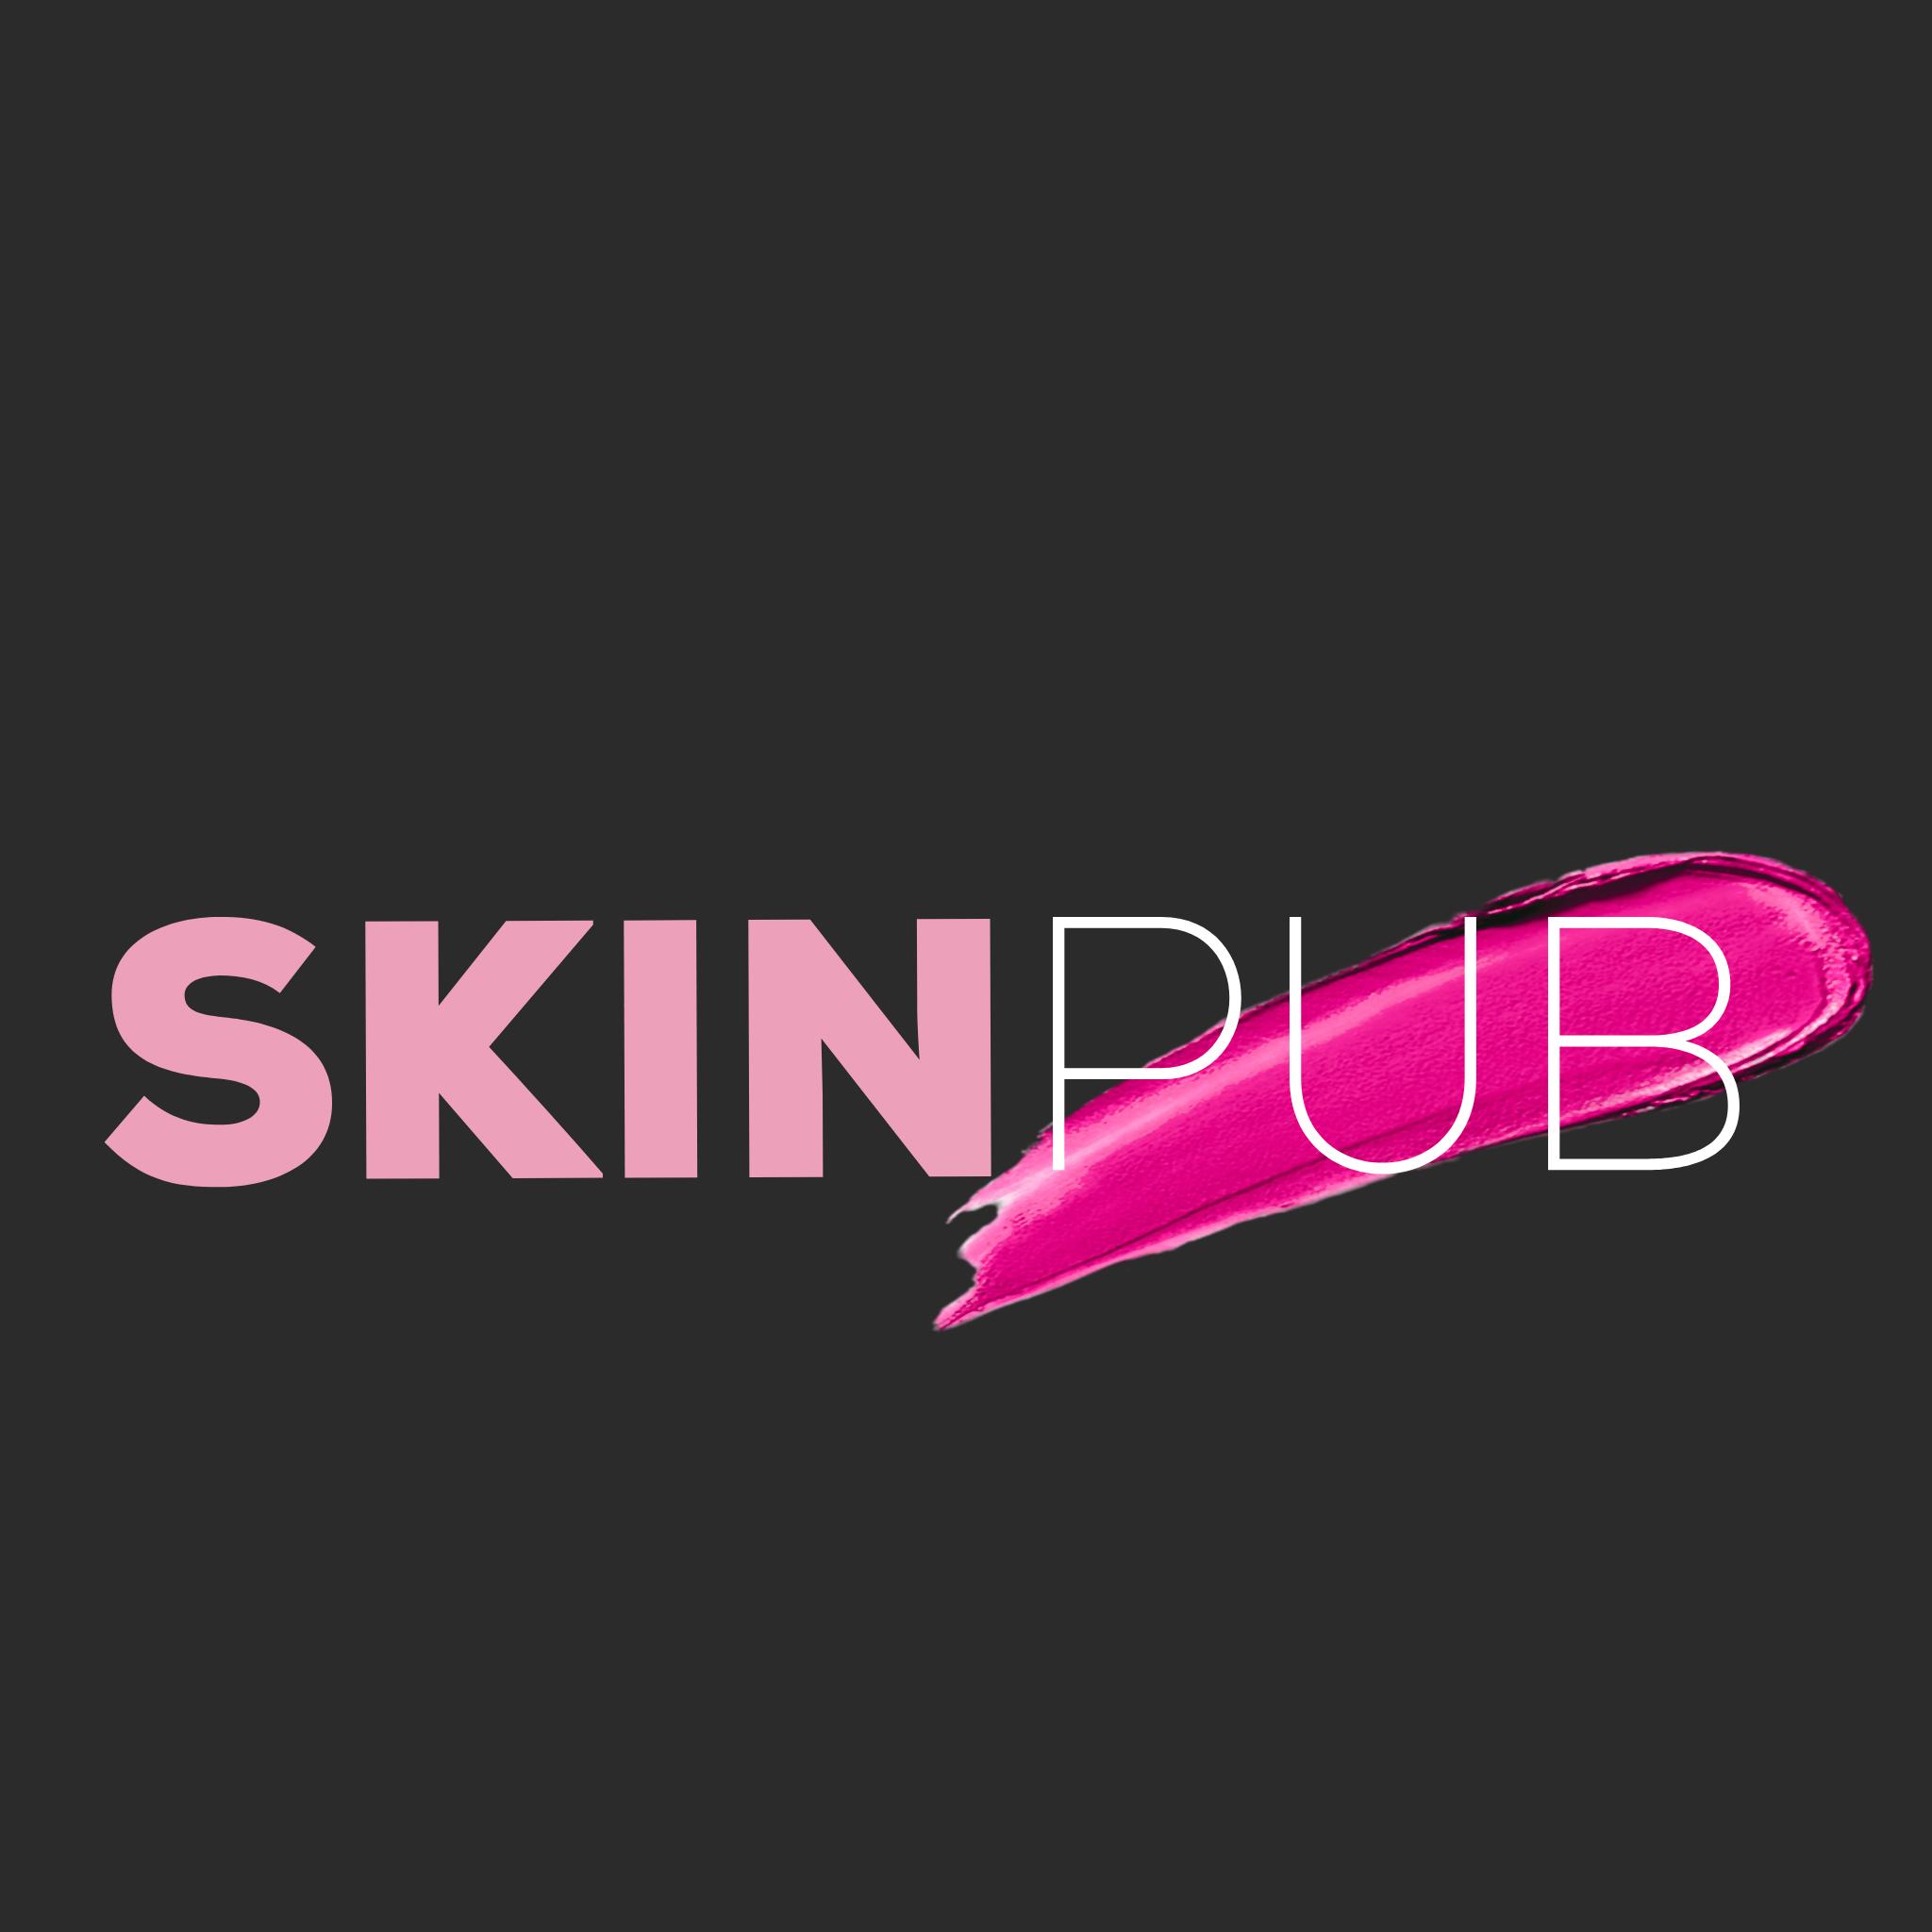 Skin Pub